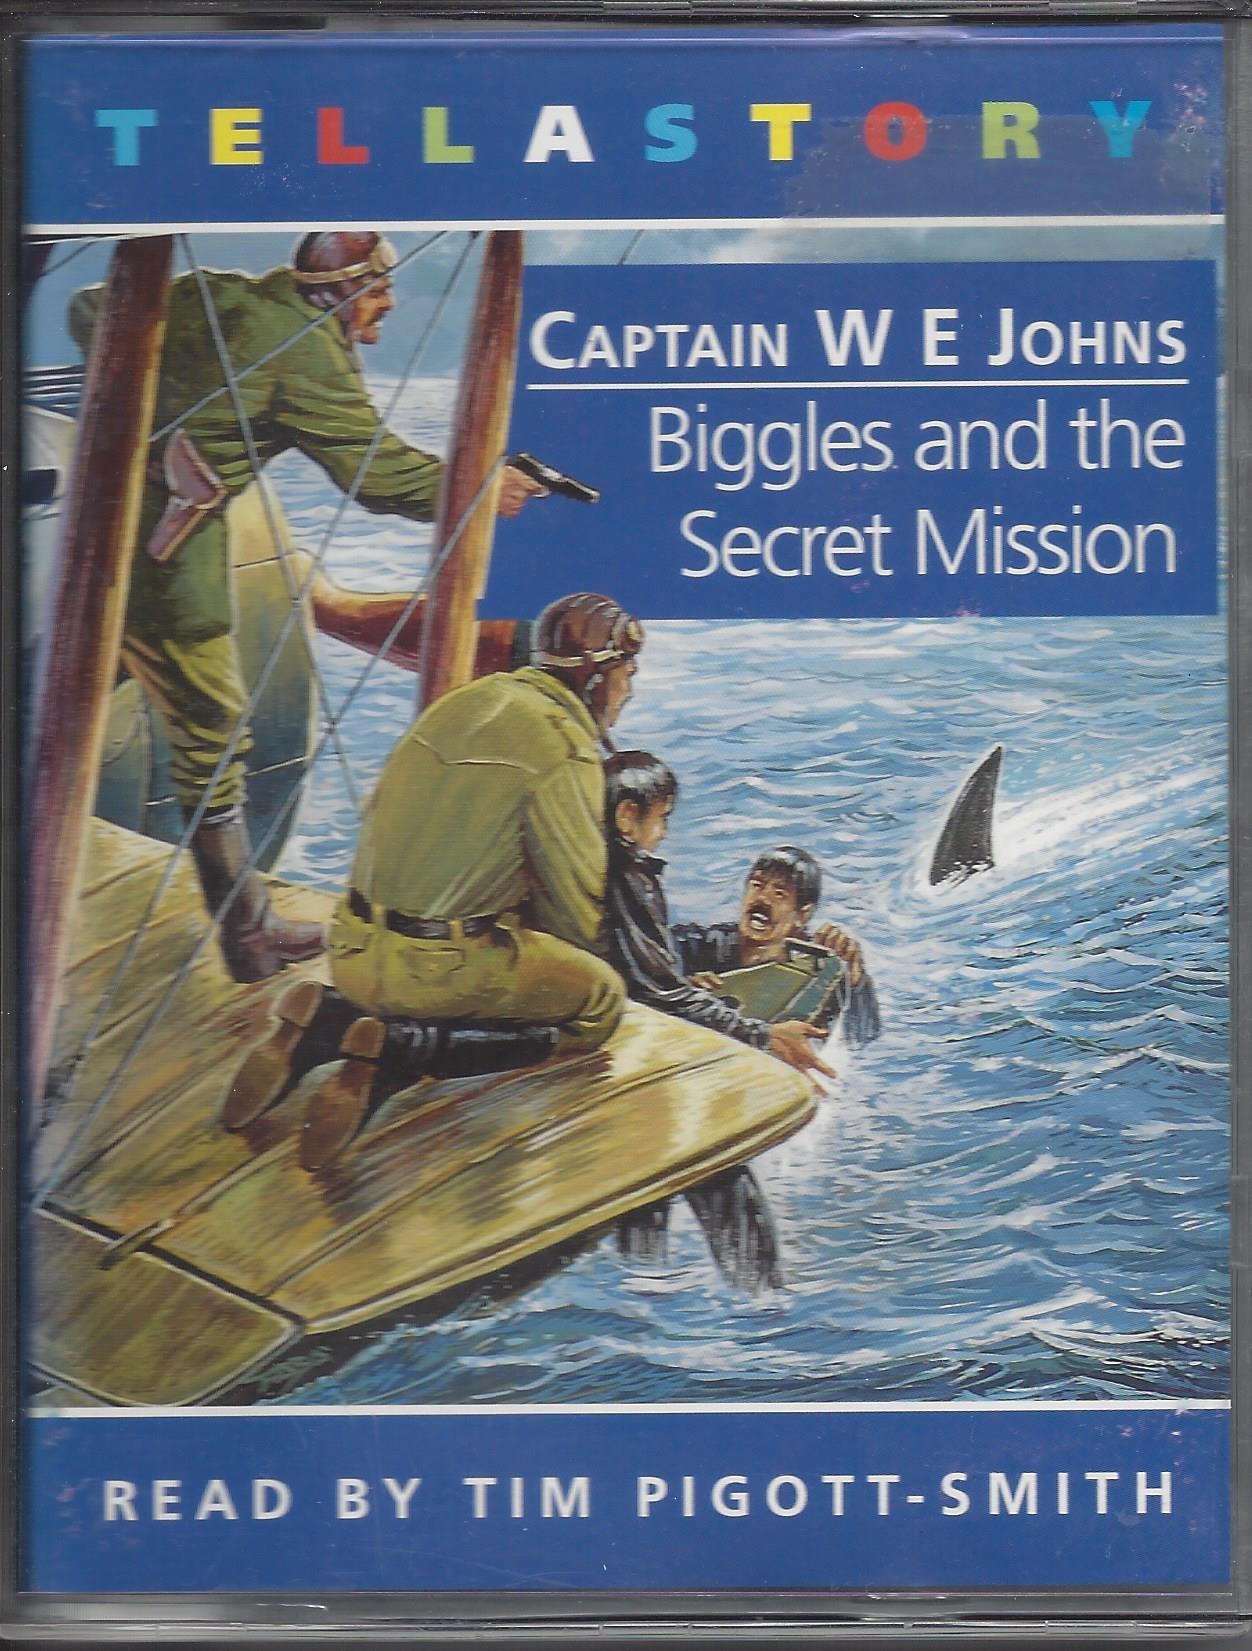 Biggles and the Secret Mission: Amazon.co.uk: W. E. Johns, Tim  Pigott-Smith: 9781856563222: Books